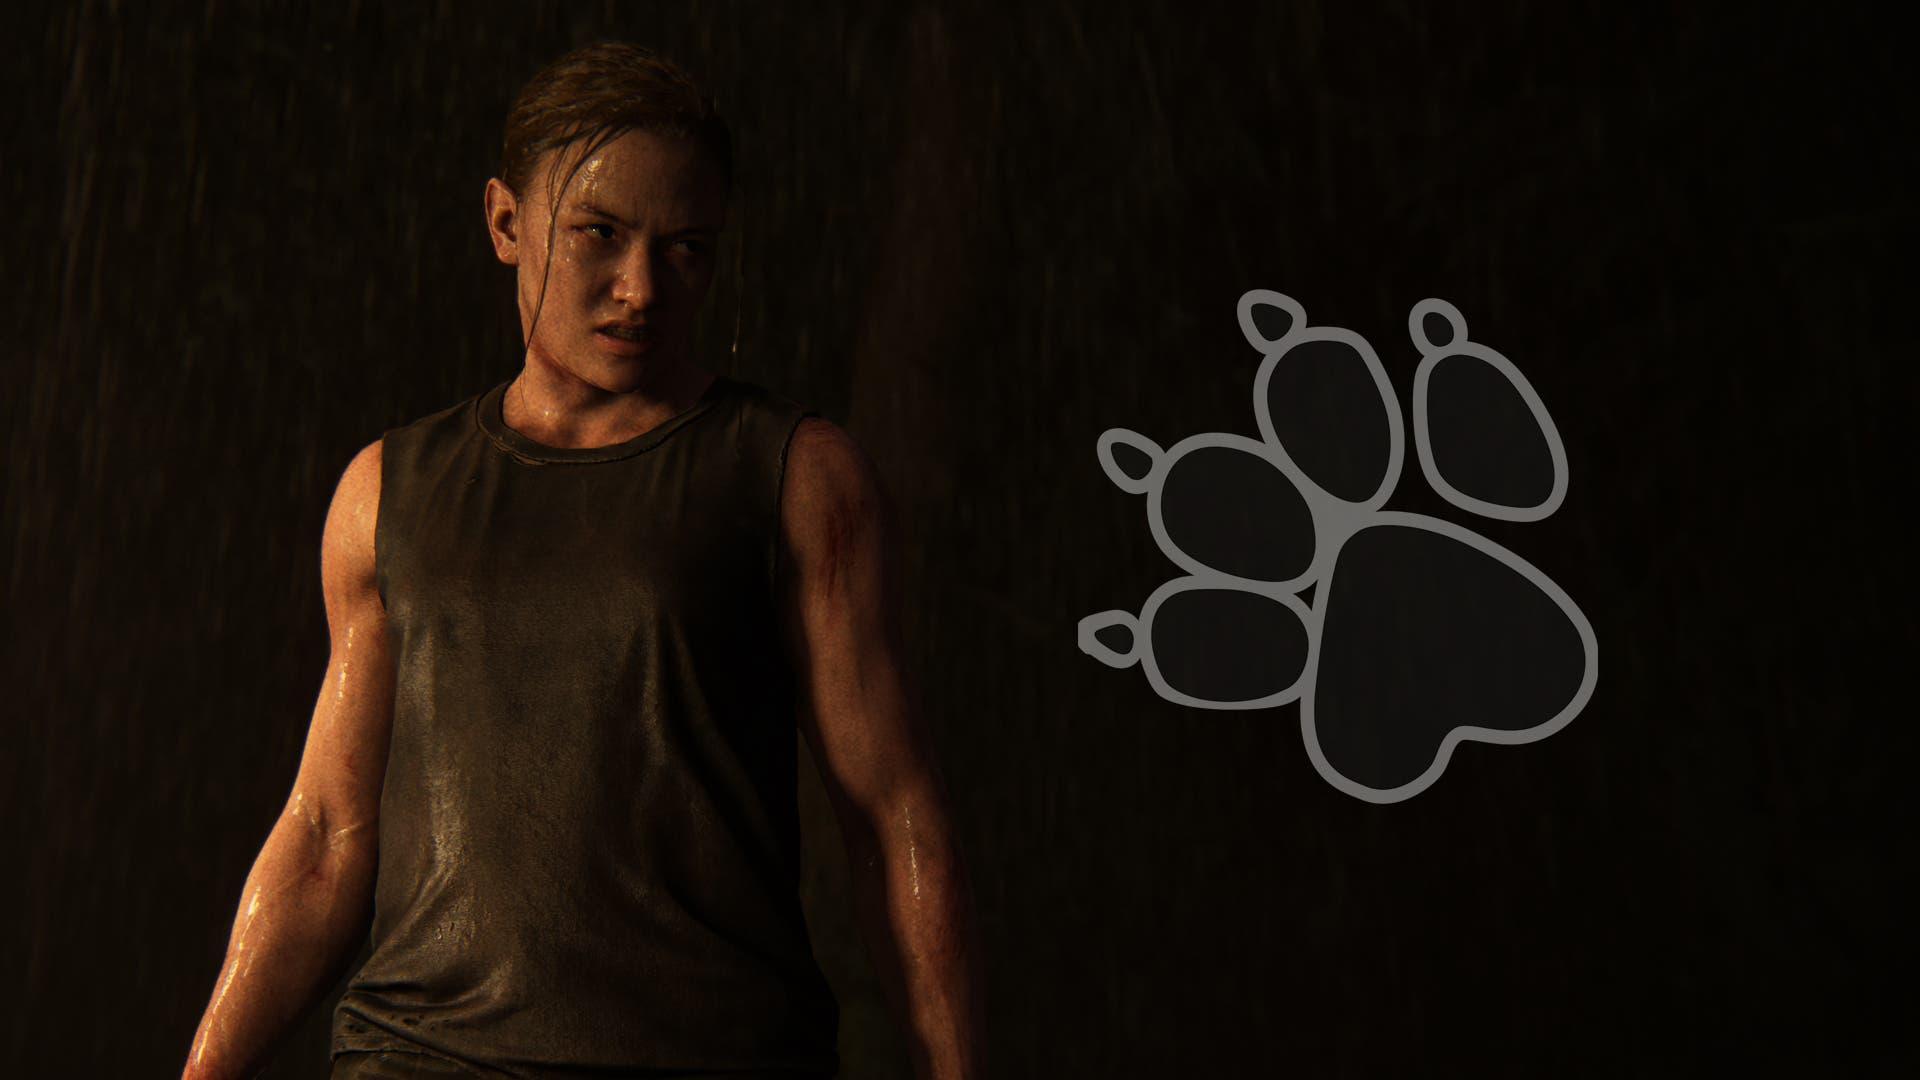 Imagen de Neil Druckmann revela que habrá un perro en The Last of Us Part II